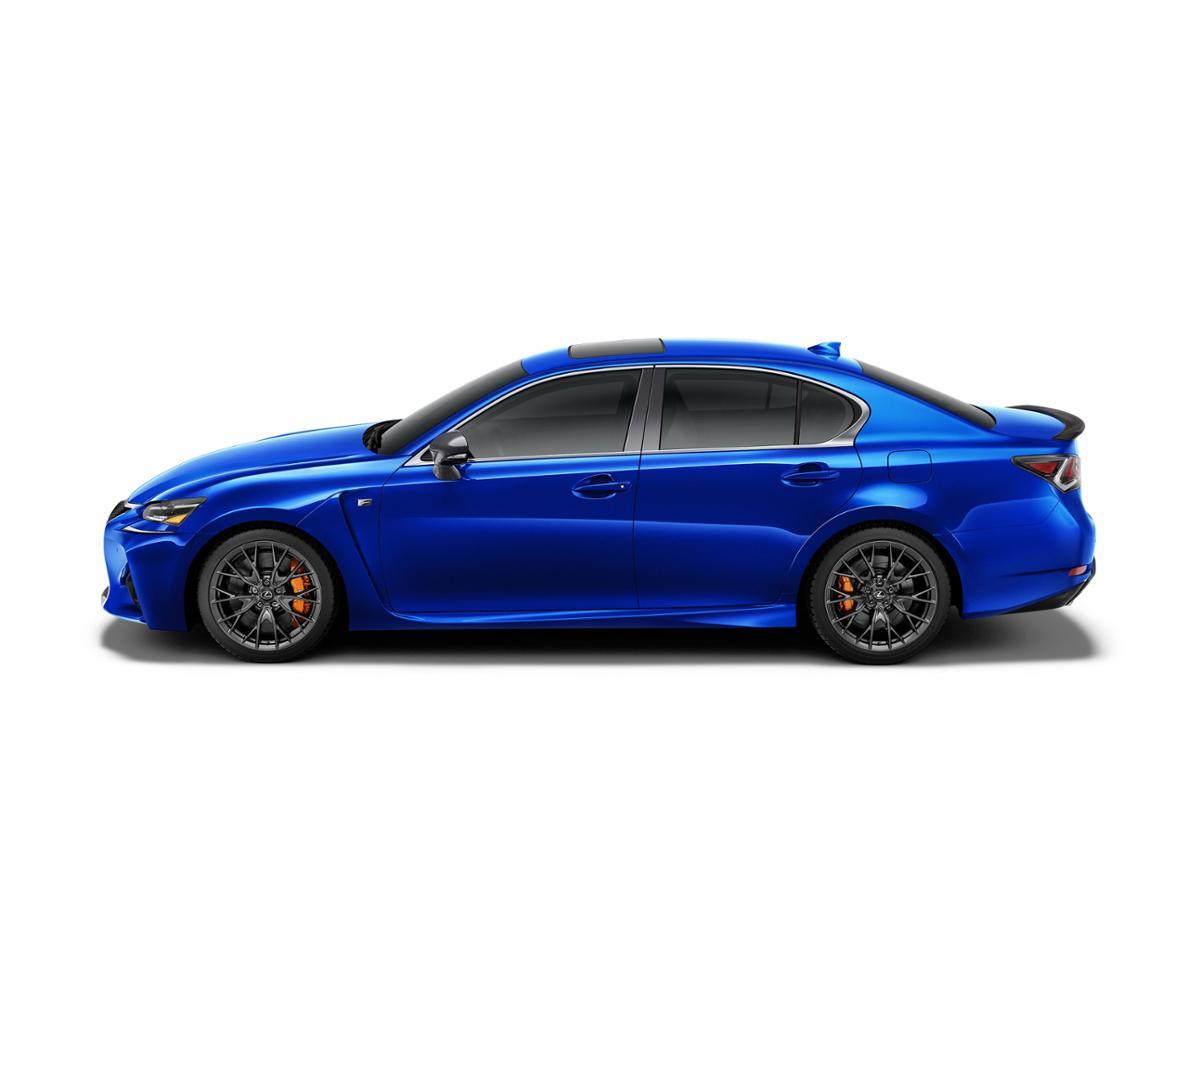 Lexus Gs For Sale: 2018 Lexus GS F Ultrasonic Blue Mica : New Car